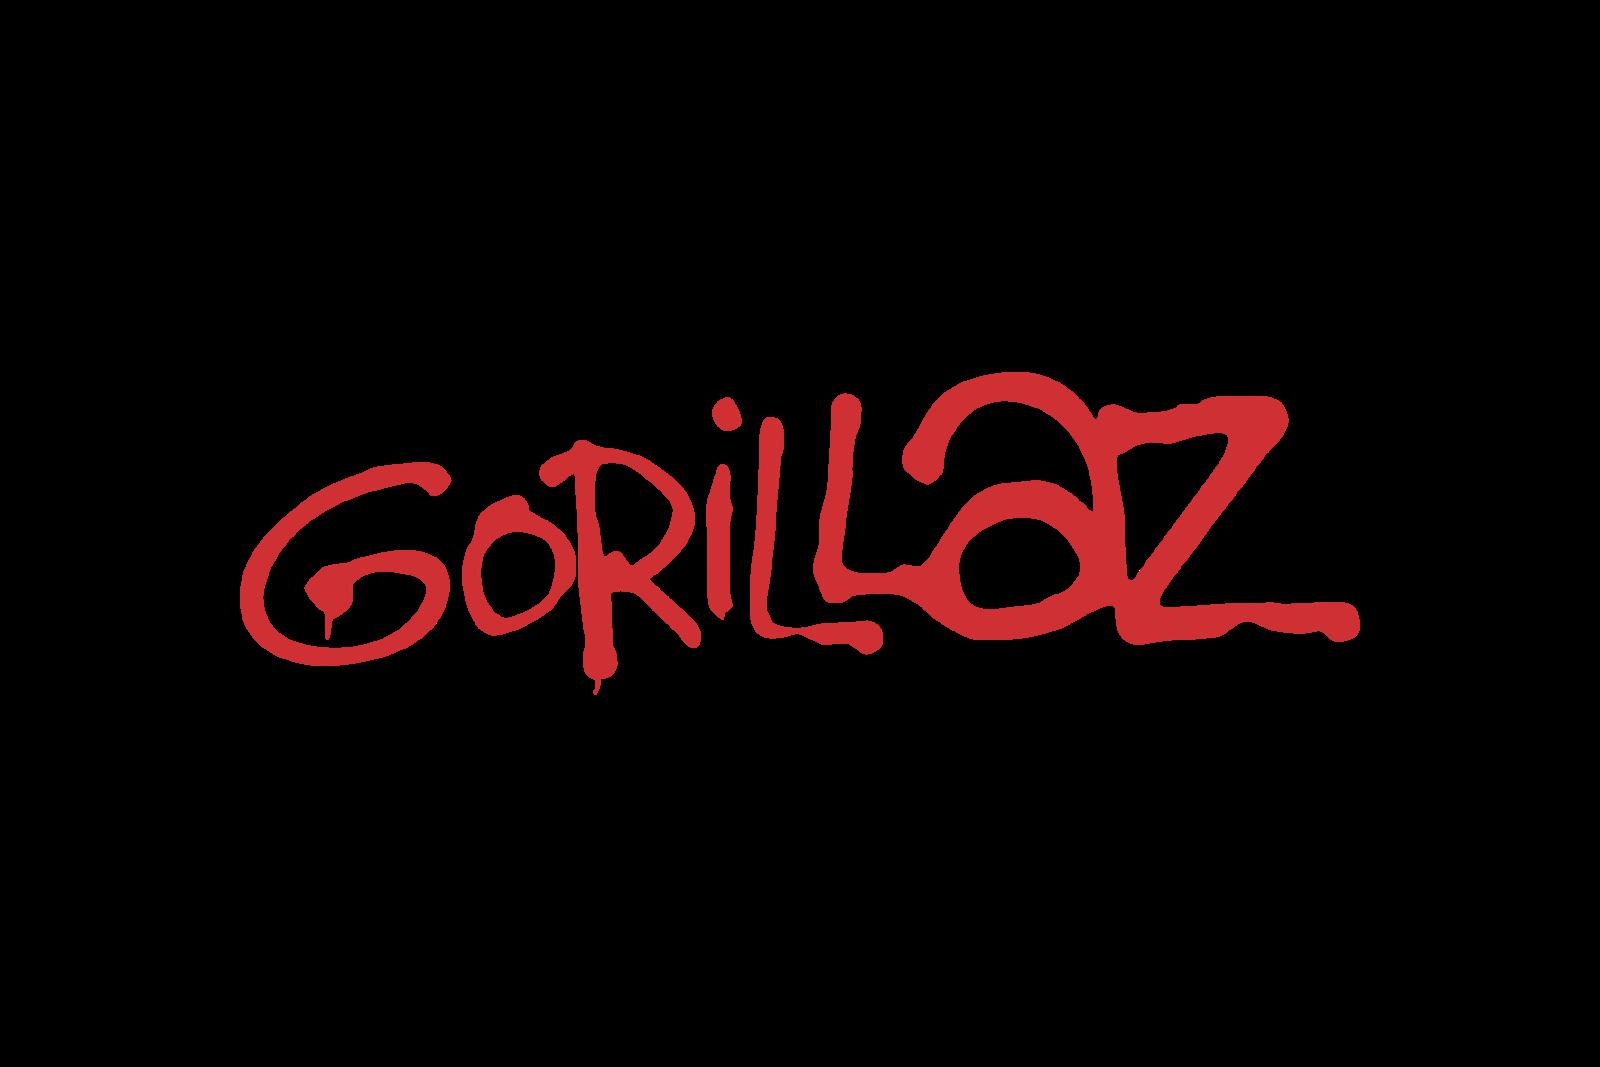 Pin By Kp Cutie On Gorillaz Gorillaz Bing Images Logos